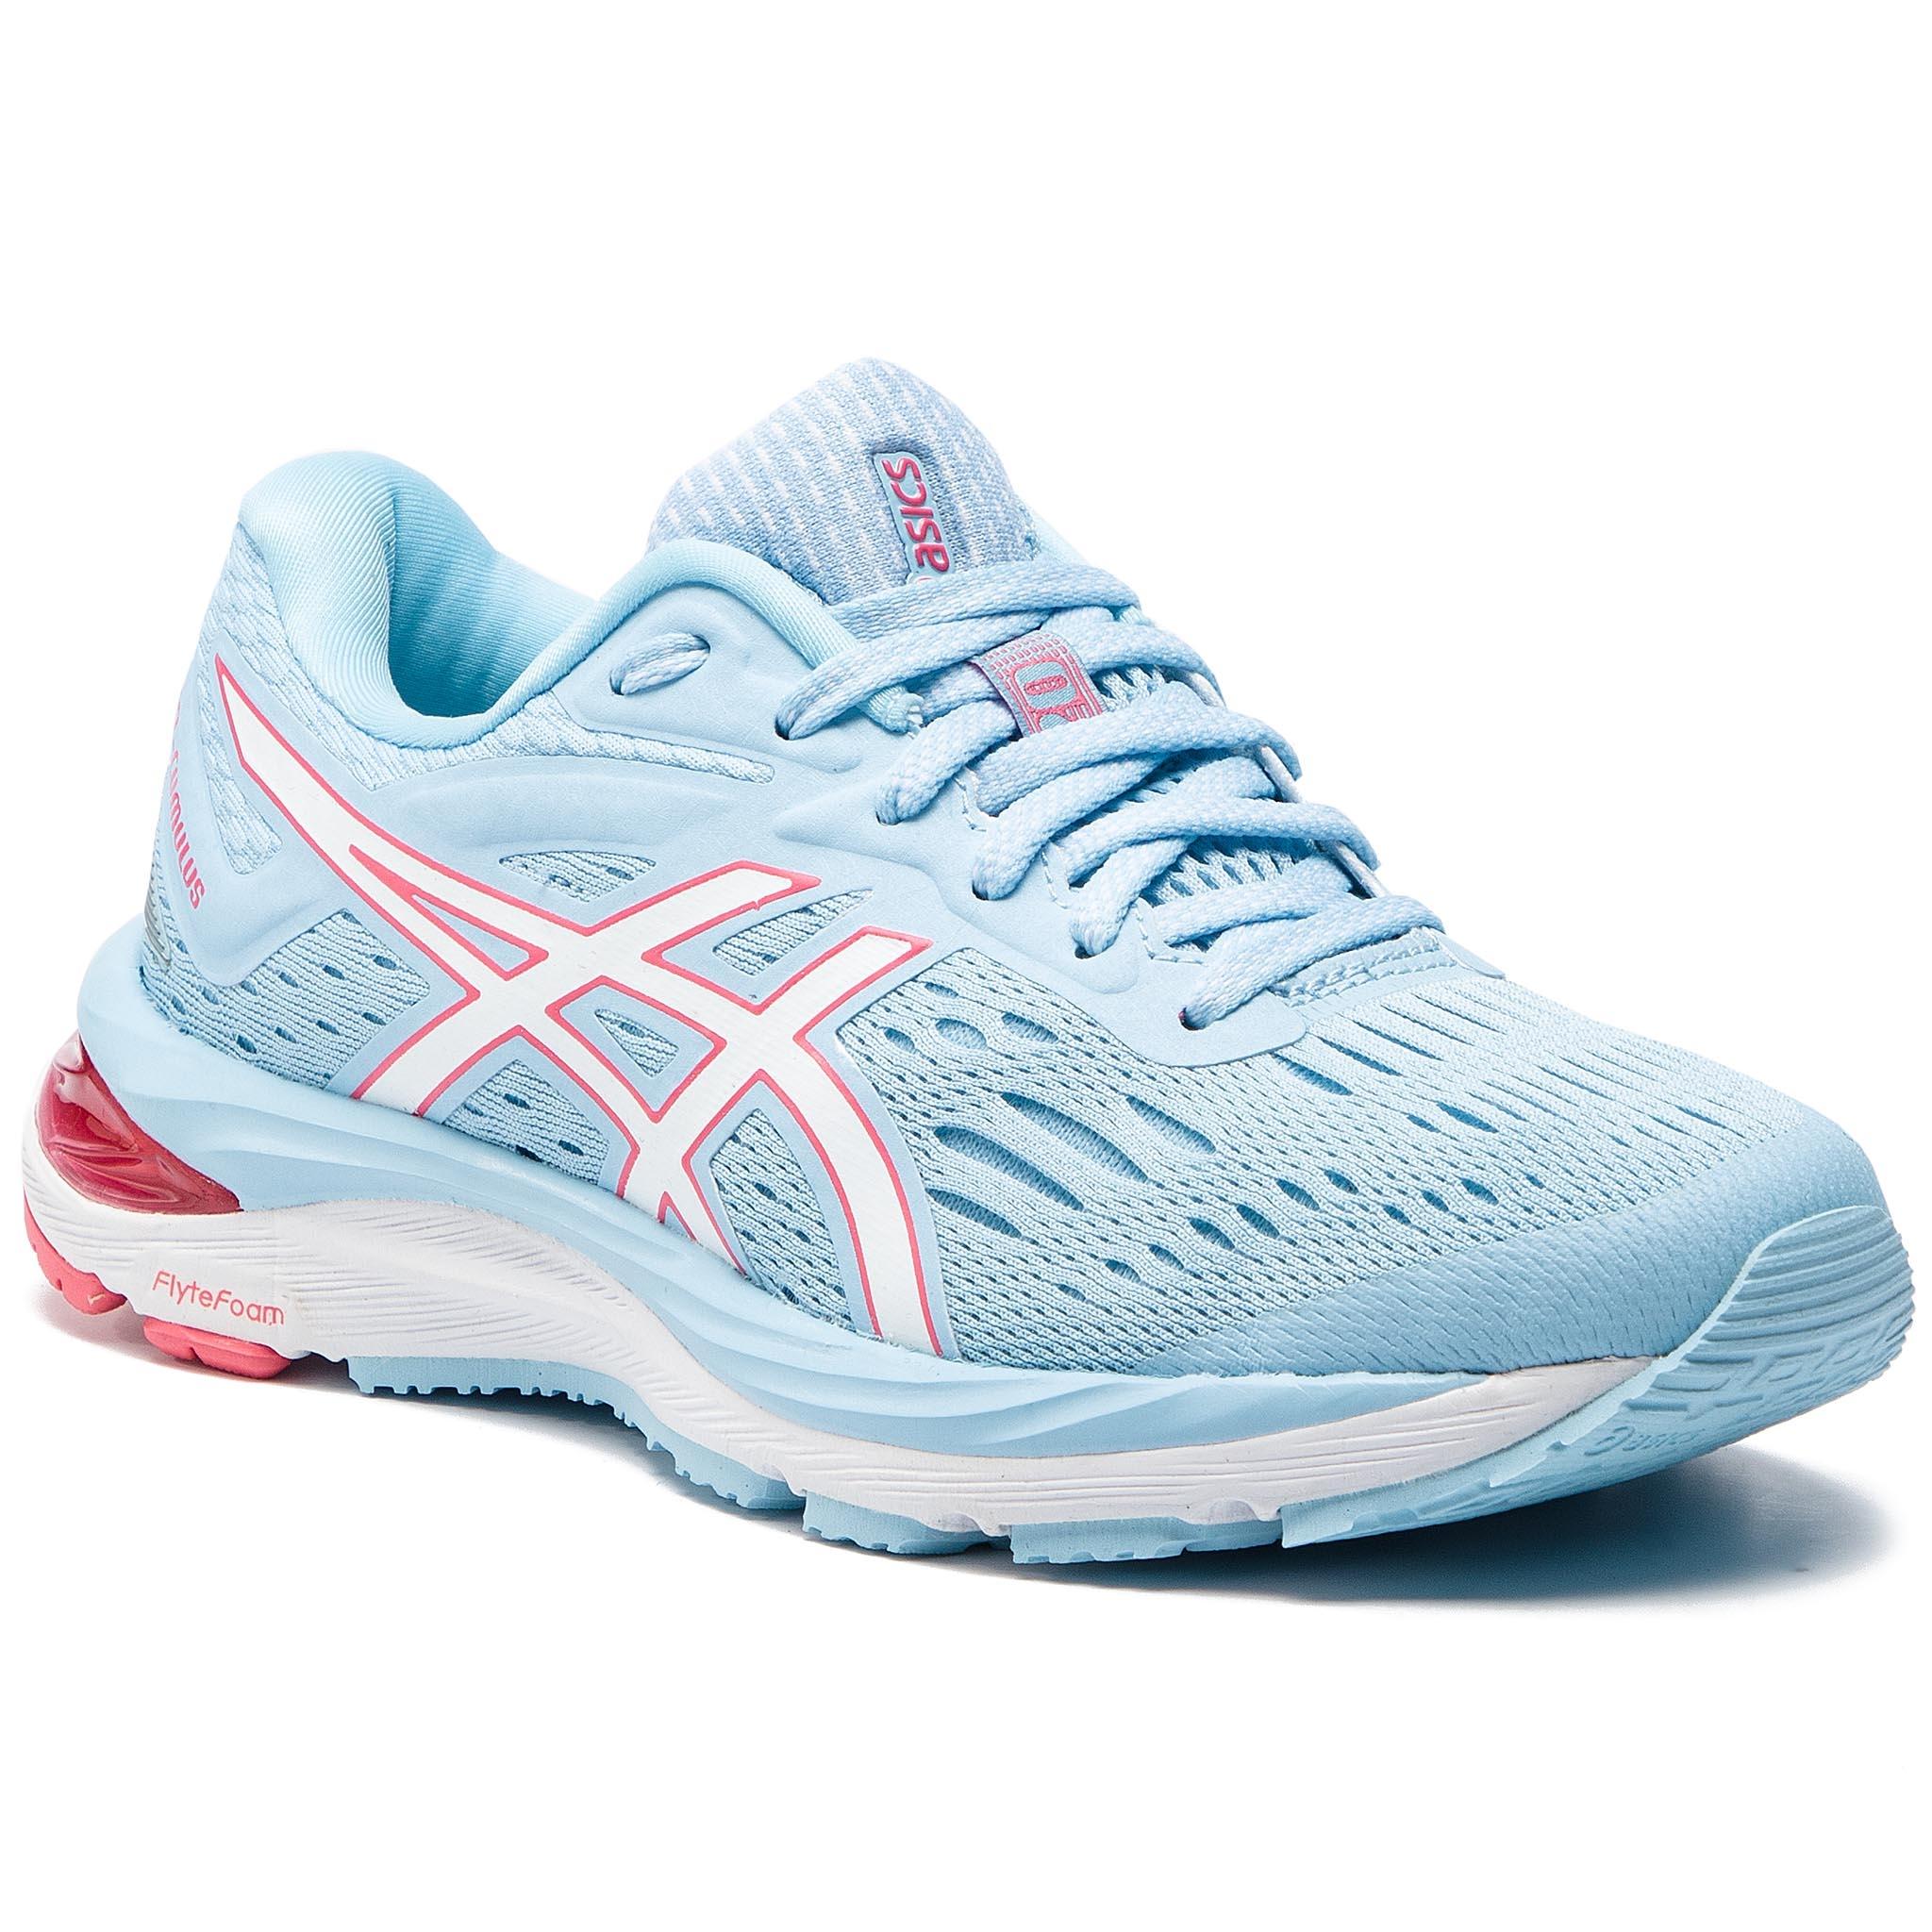 Schuhe NIKE Flex Contact 2 AA7409 003 BlackRush Pink